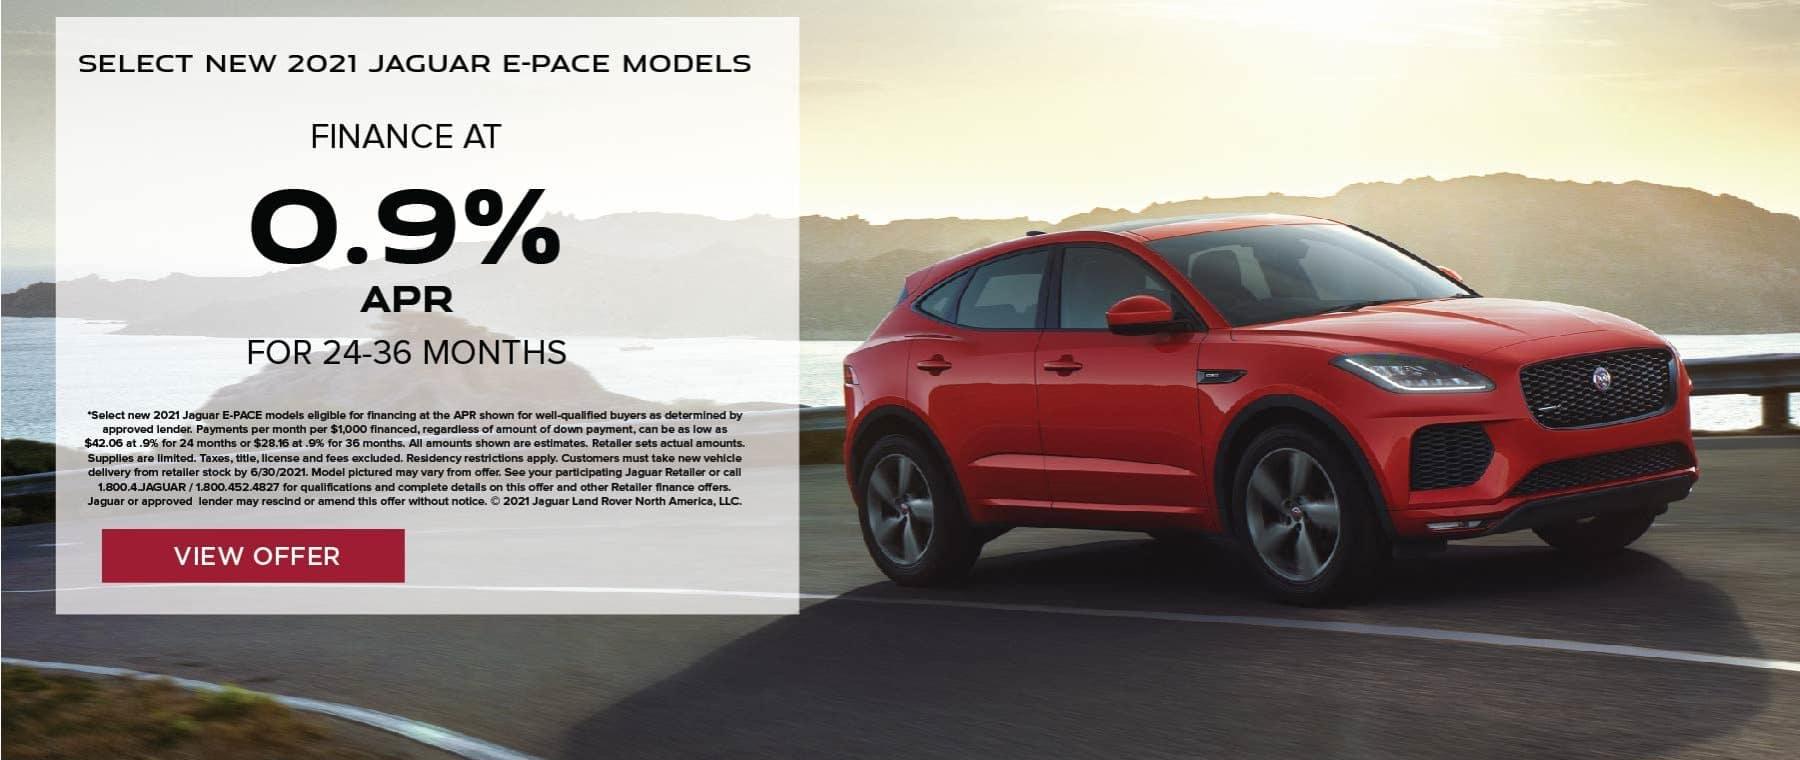 North Scottsdale – Jaguar – Homepage Slides (Offers)_2021 E-PACE – APR